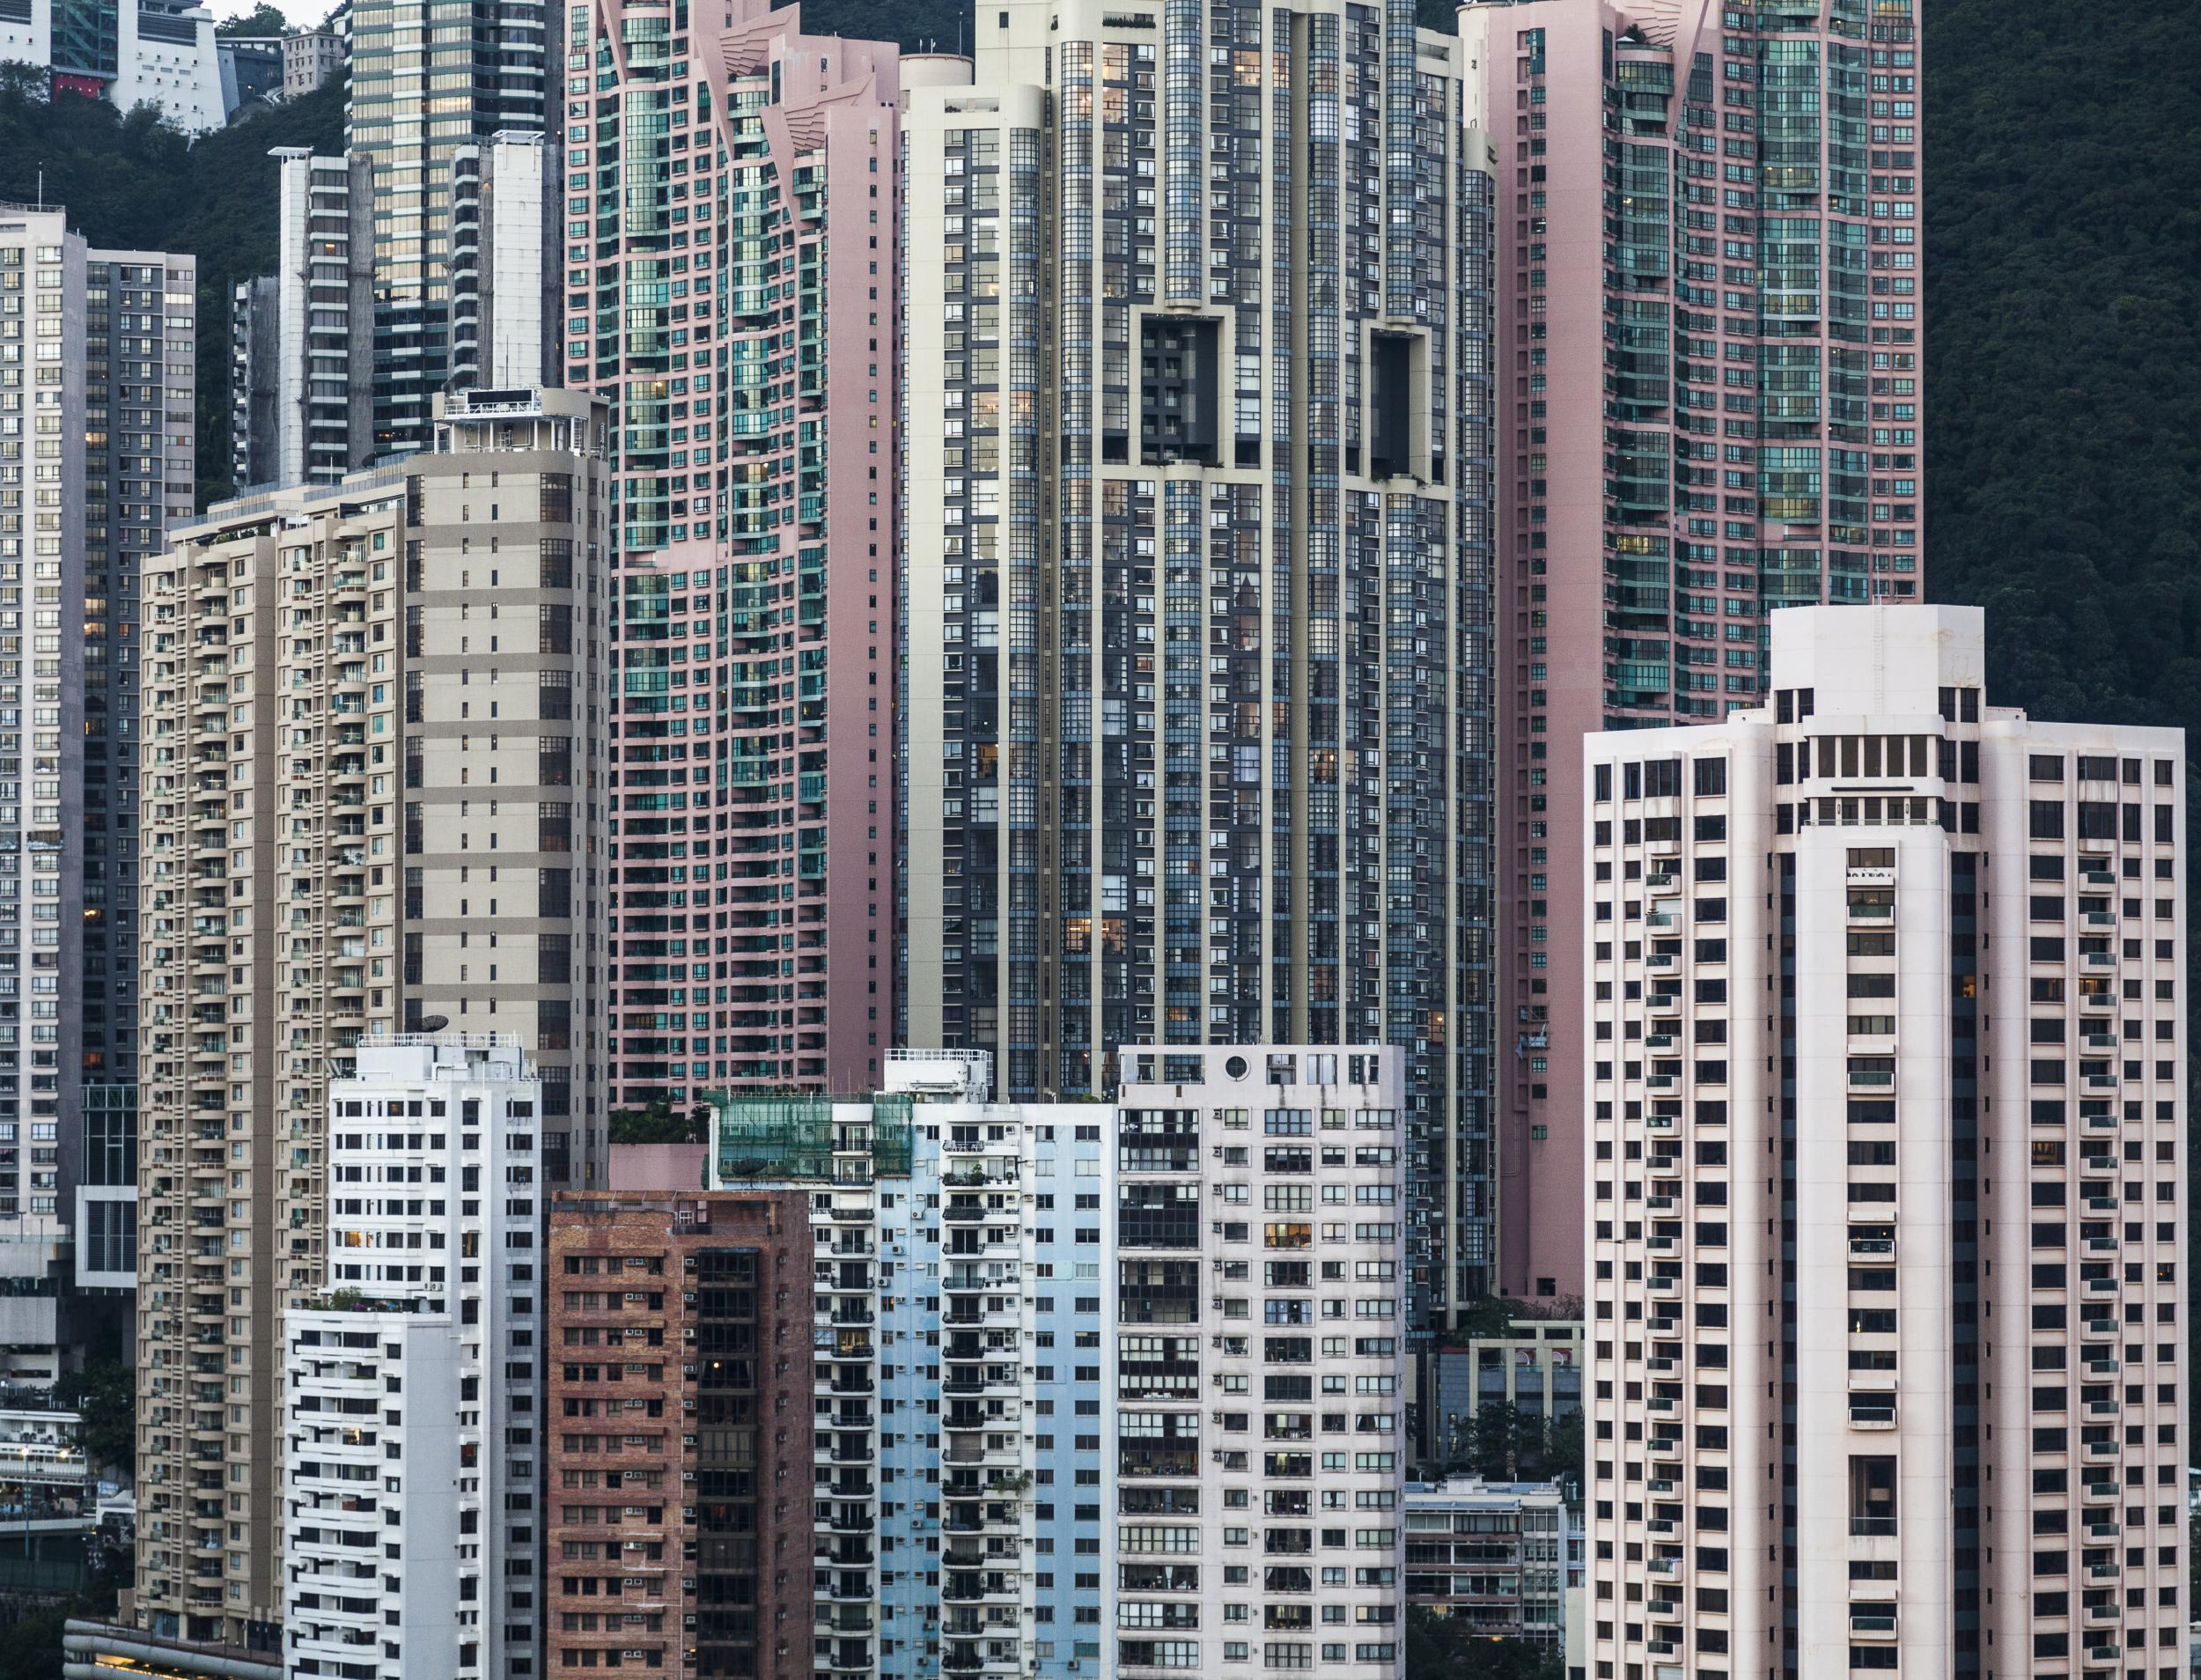 Hong Kong 2020: Perspectives on an Ongoing Crisis